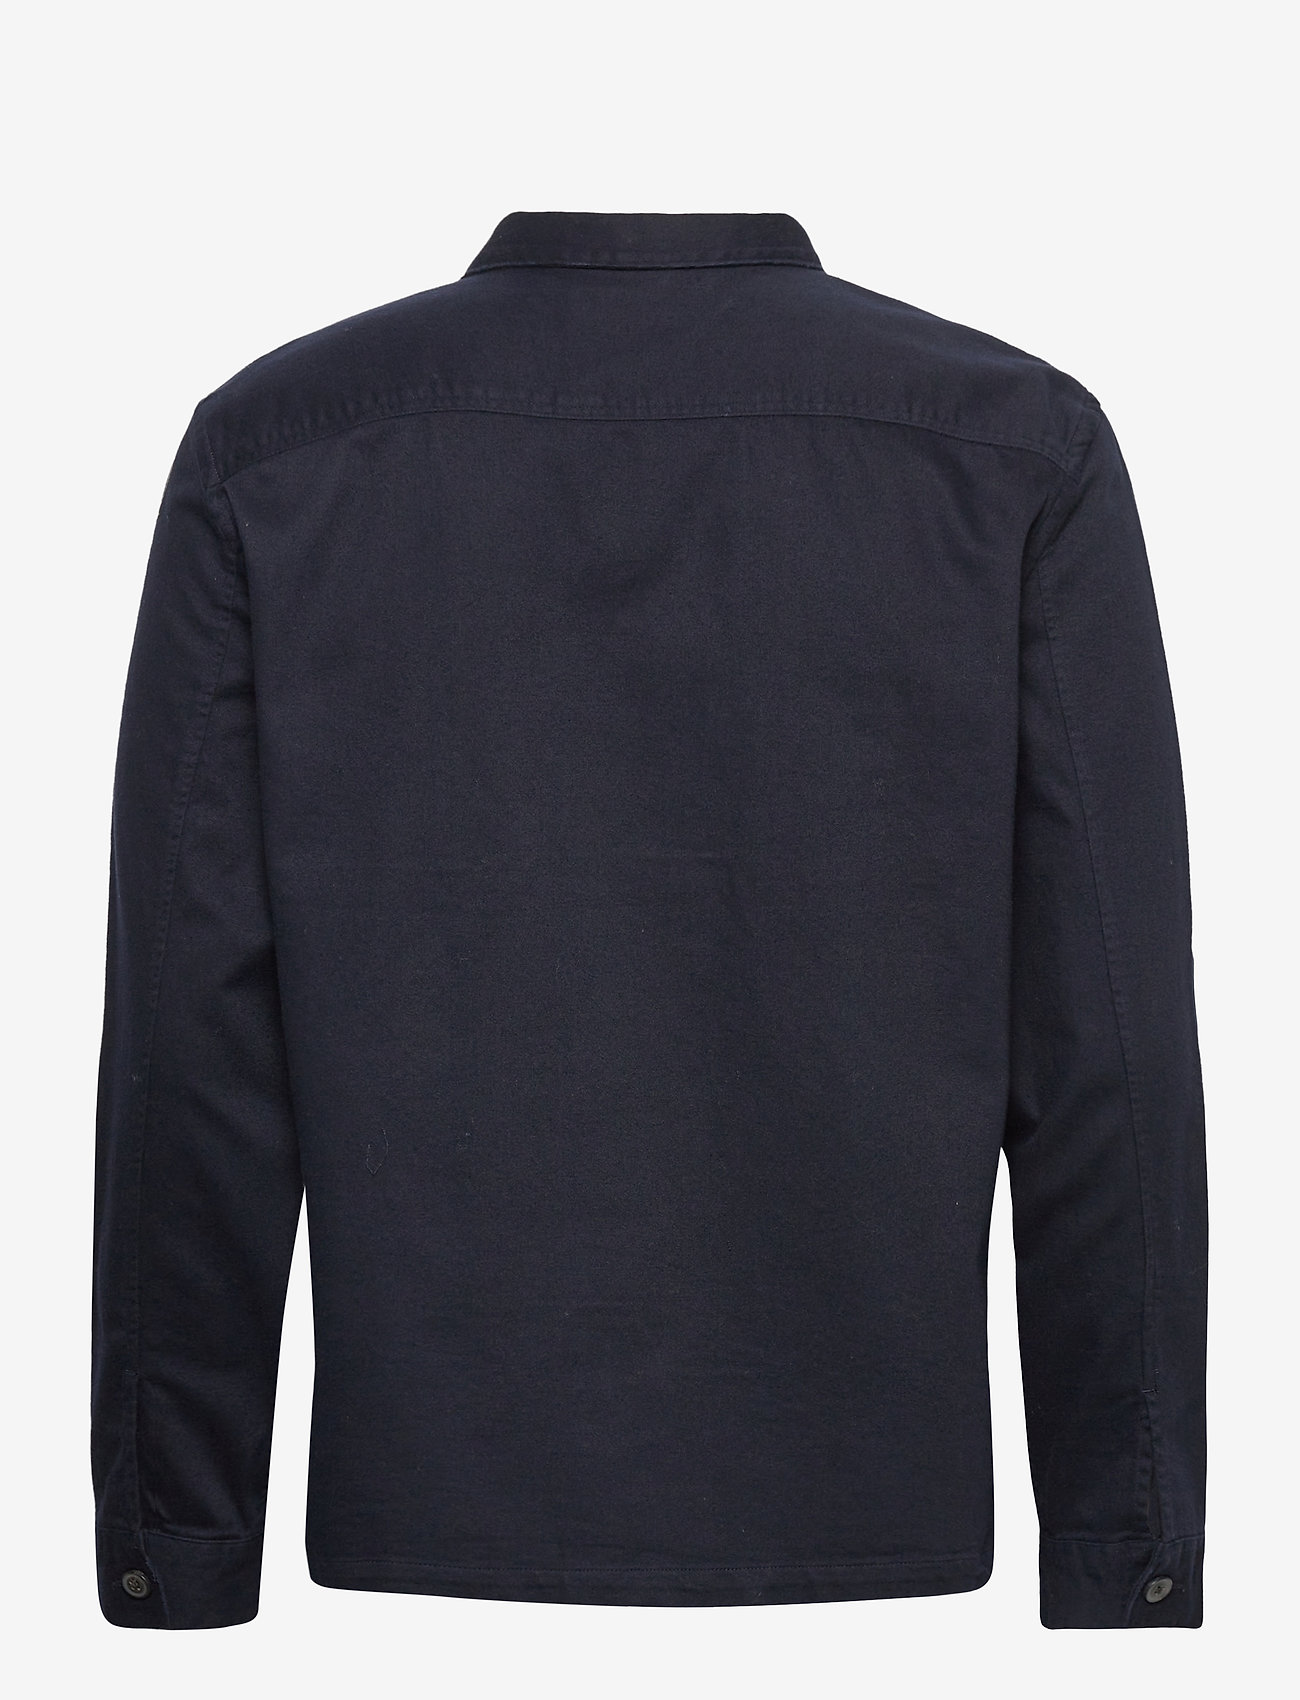 AllSaints - ADJUTANT LS SHIRT - vêtements - dark ink - 1